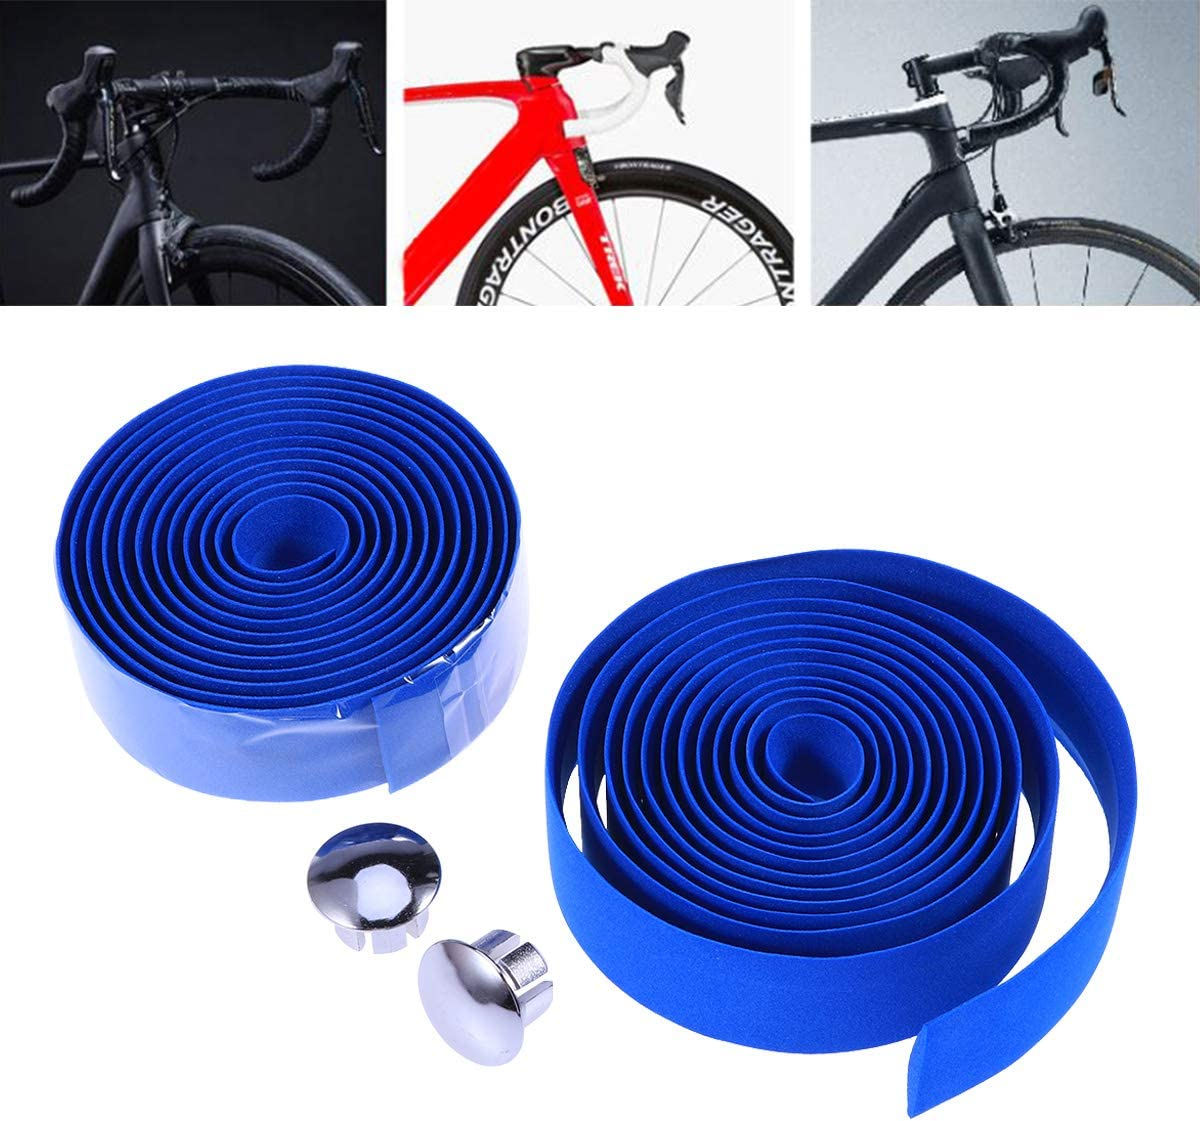 Mountain Bike Handlebar Tape Bike Bicycle Rubber Handle Grip Bar Sticker 1 Pair